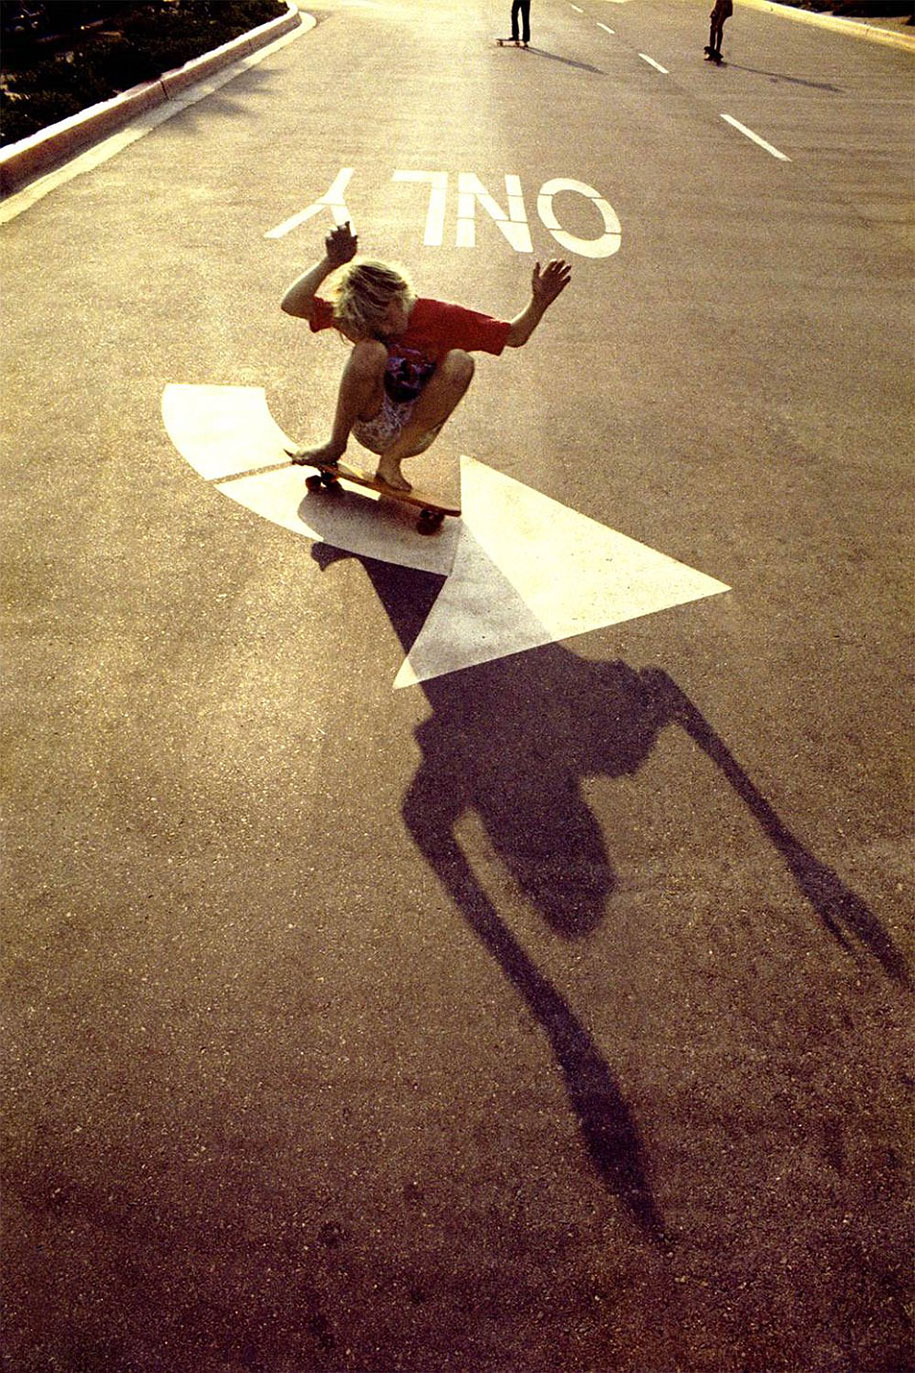 Bleach Wallpaper Hd Skateboarders In 1970 S California Captured By Hugh Holland